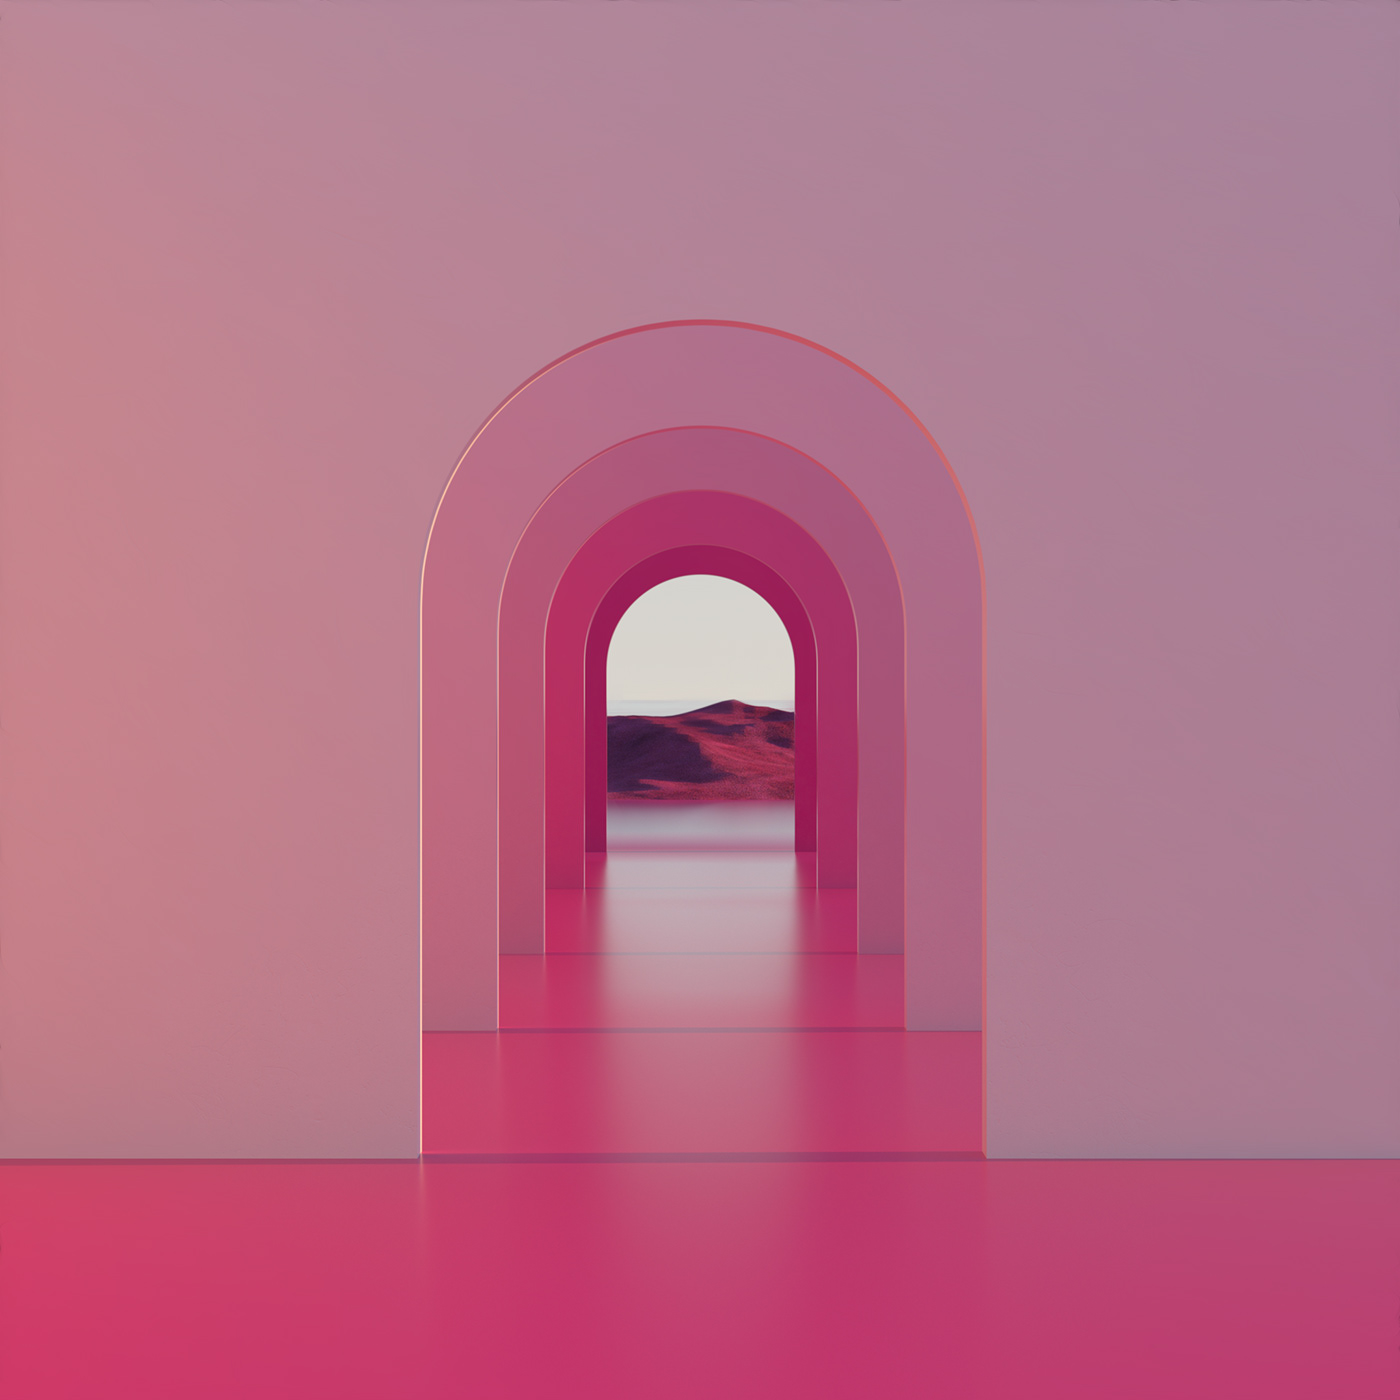 3D dreamscapes Isolation landscapes